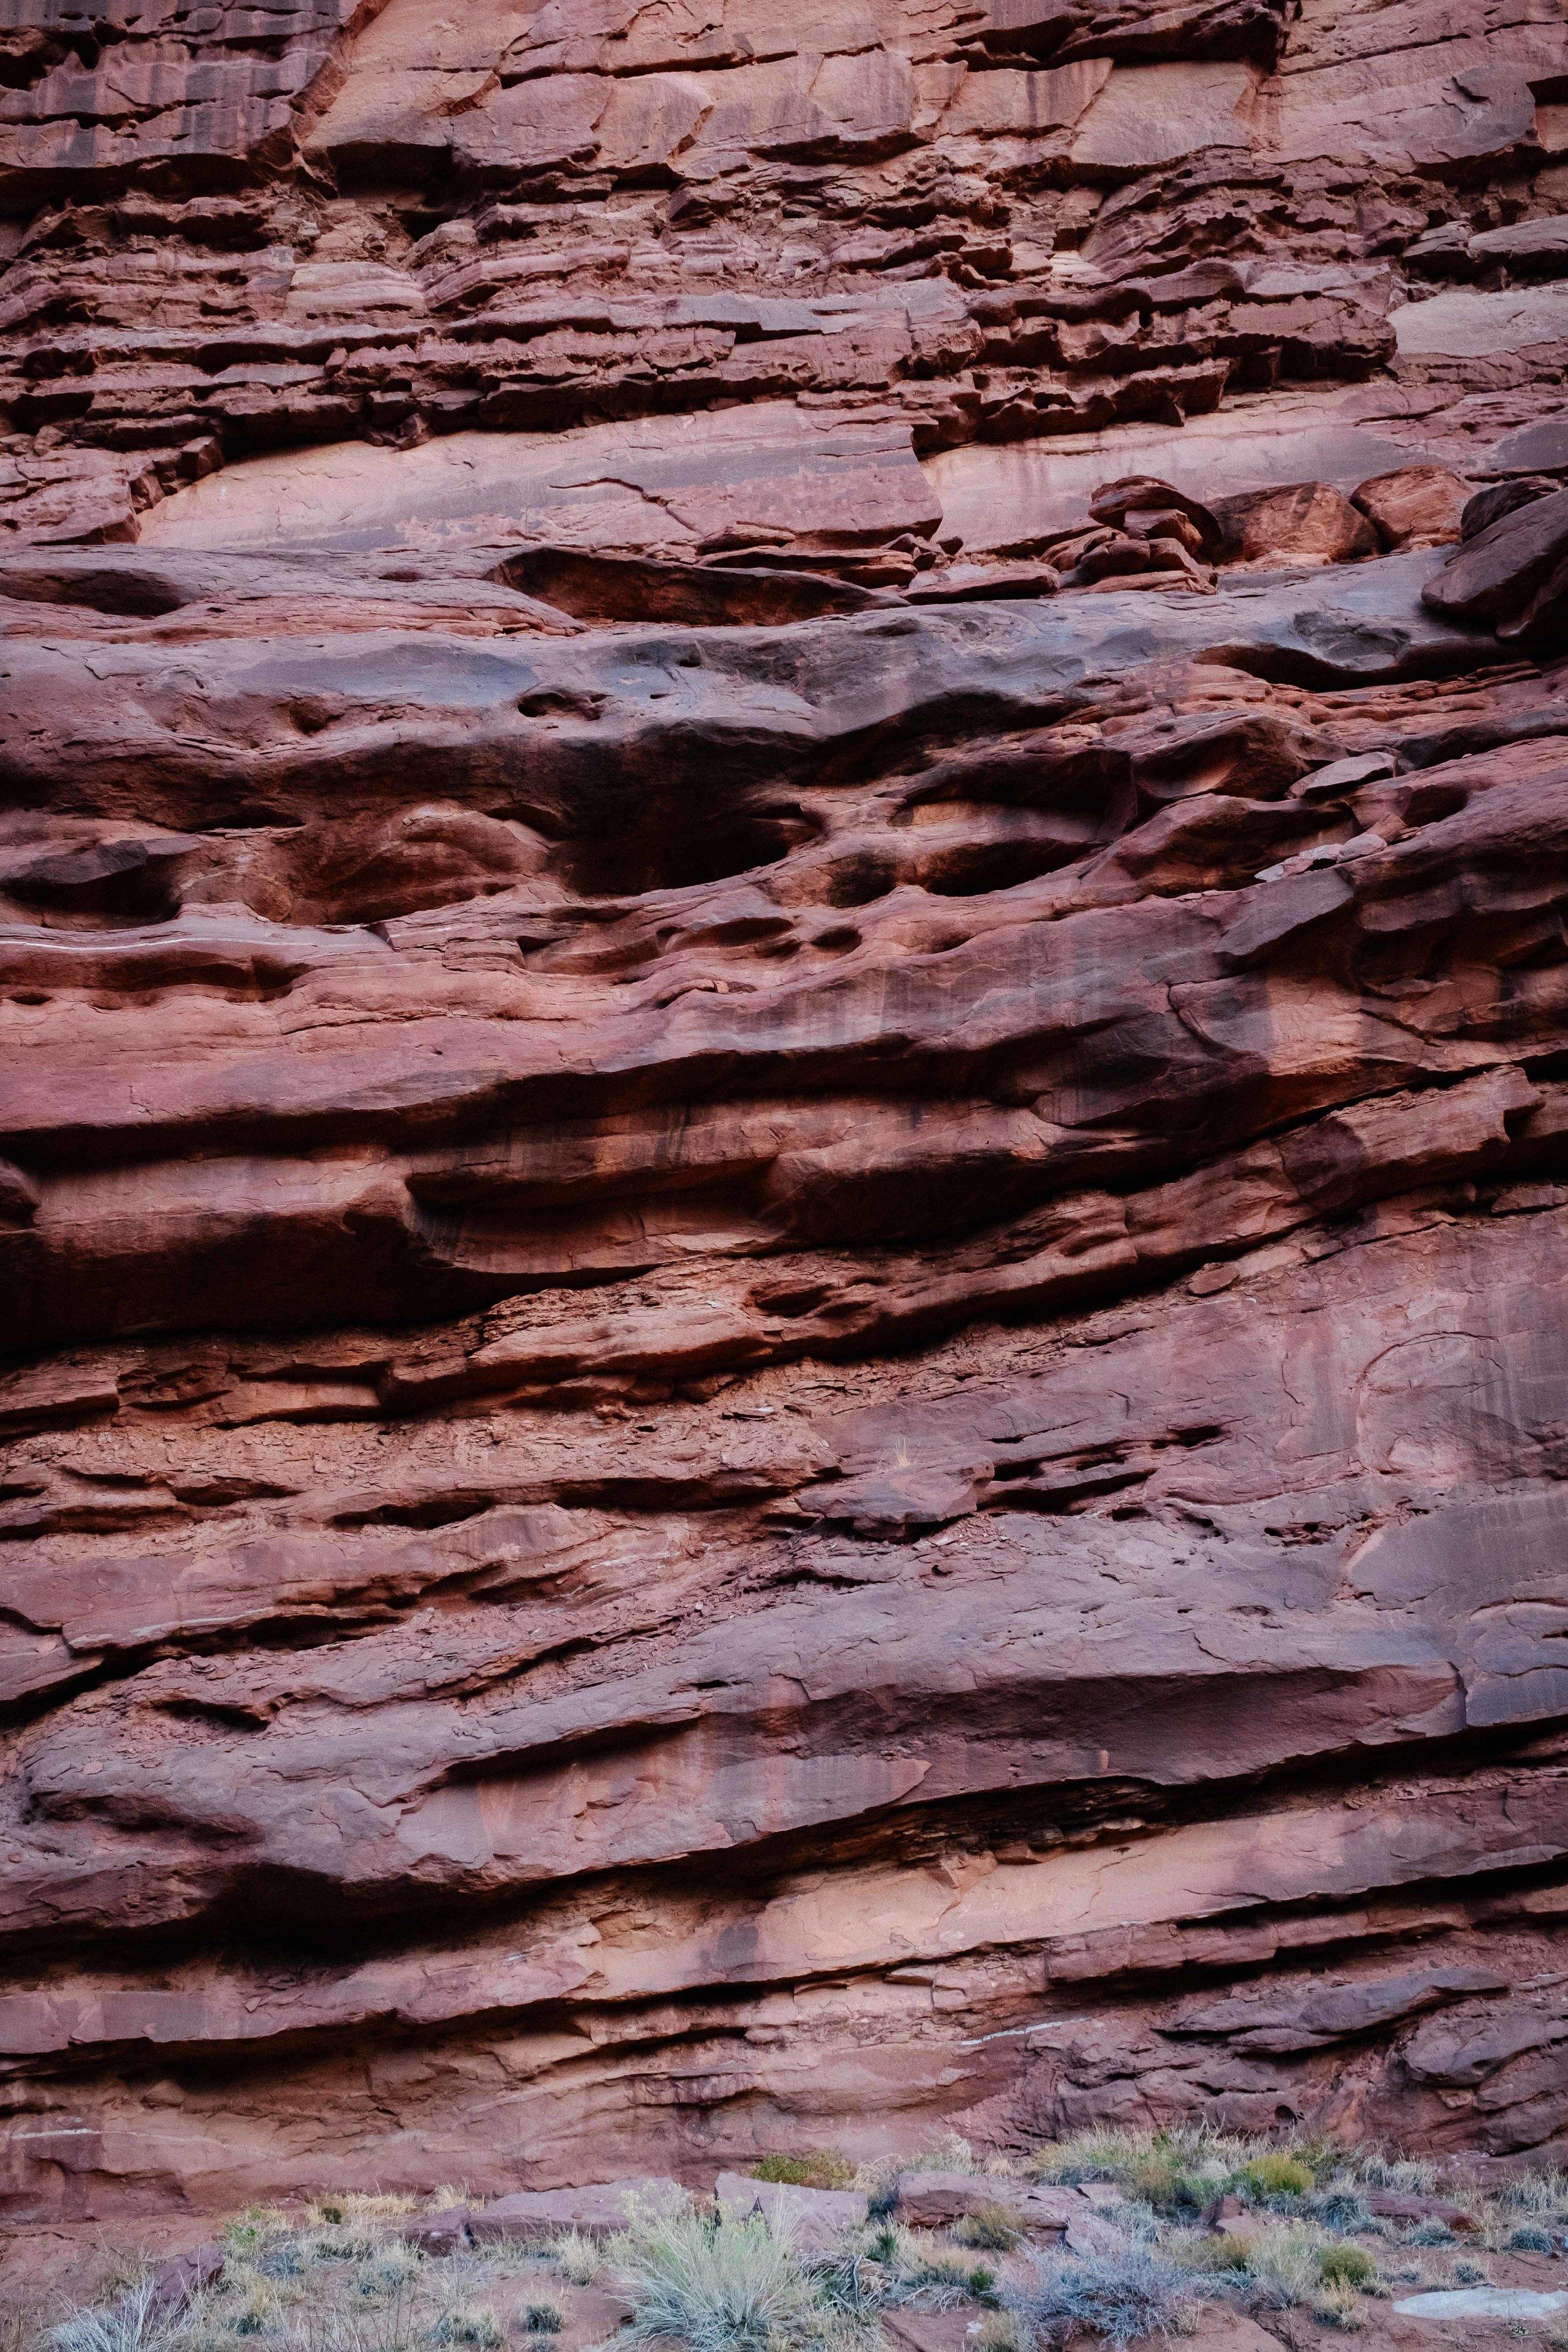 Textures of the canyon walls along Onion Creek Road. Fuji X100F